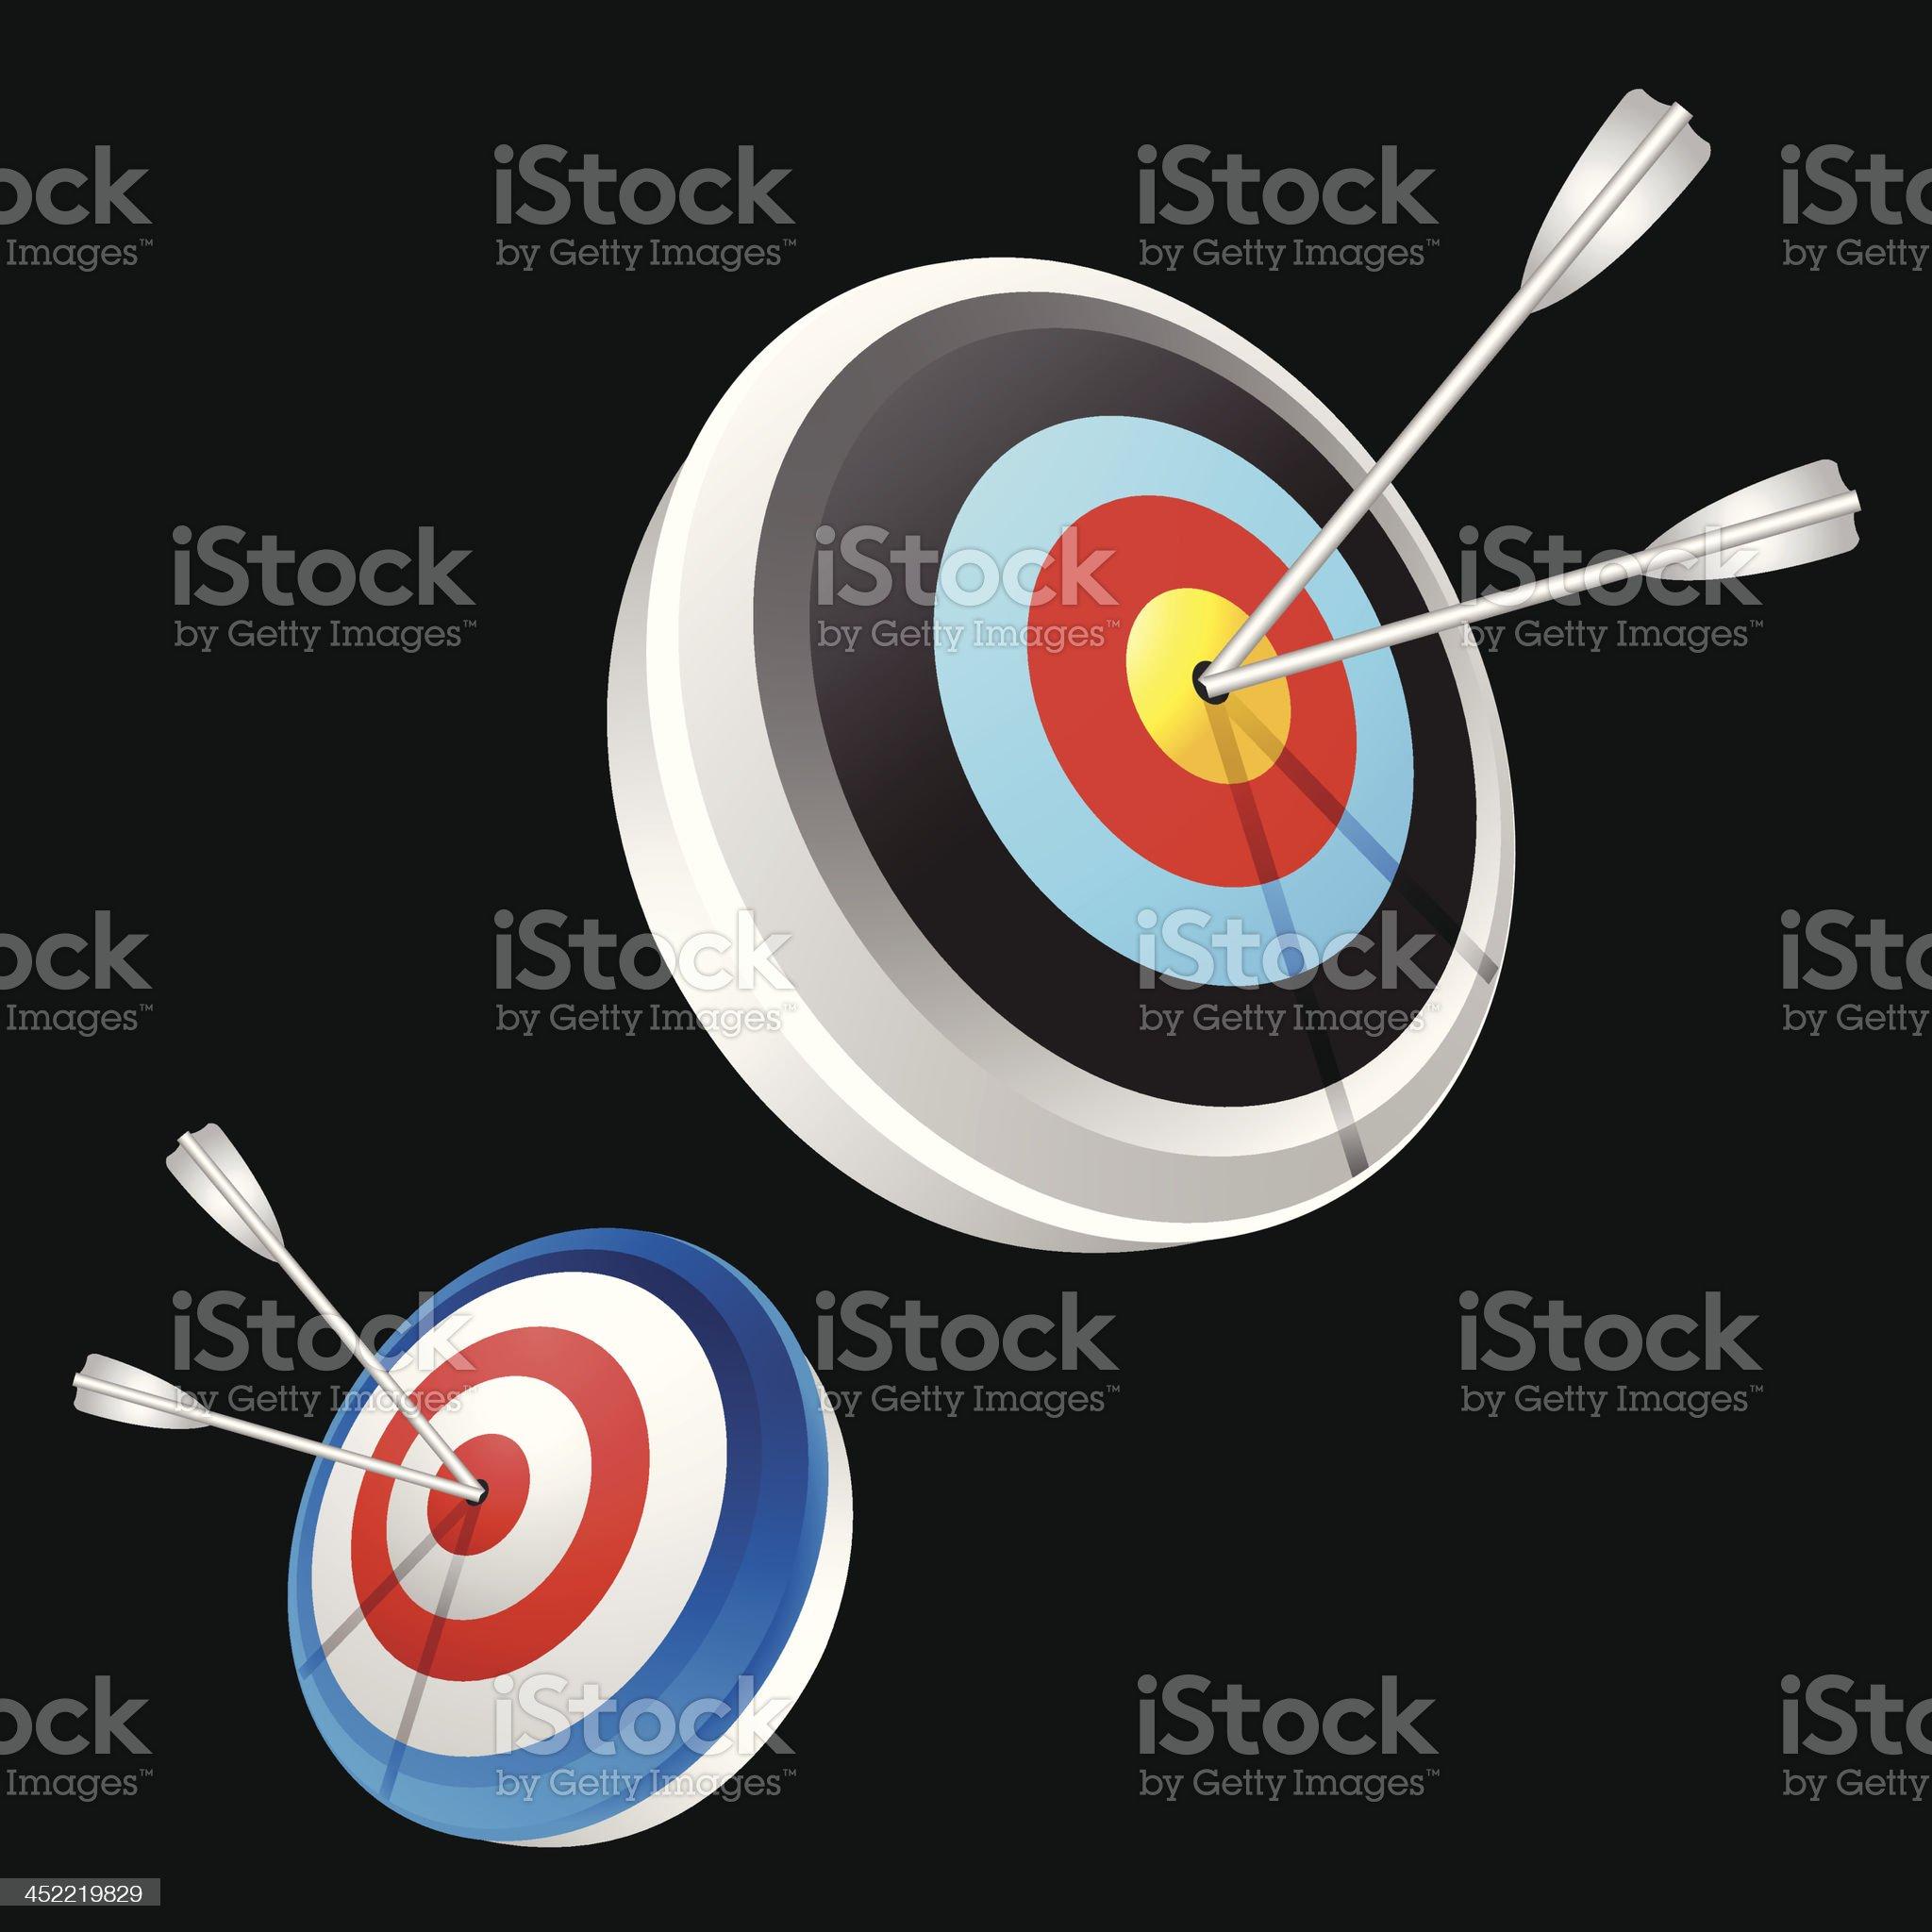 Dart Hitting A Target royalty-free stock vector art